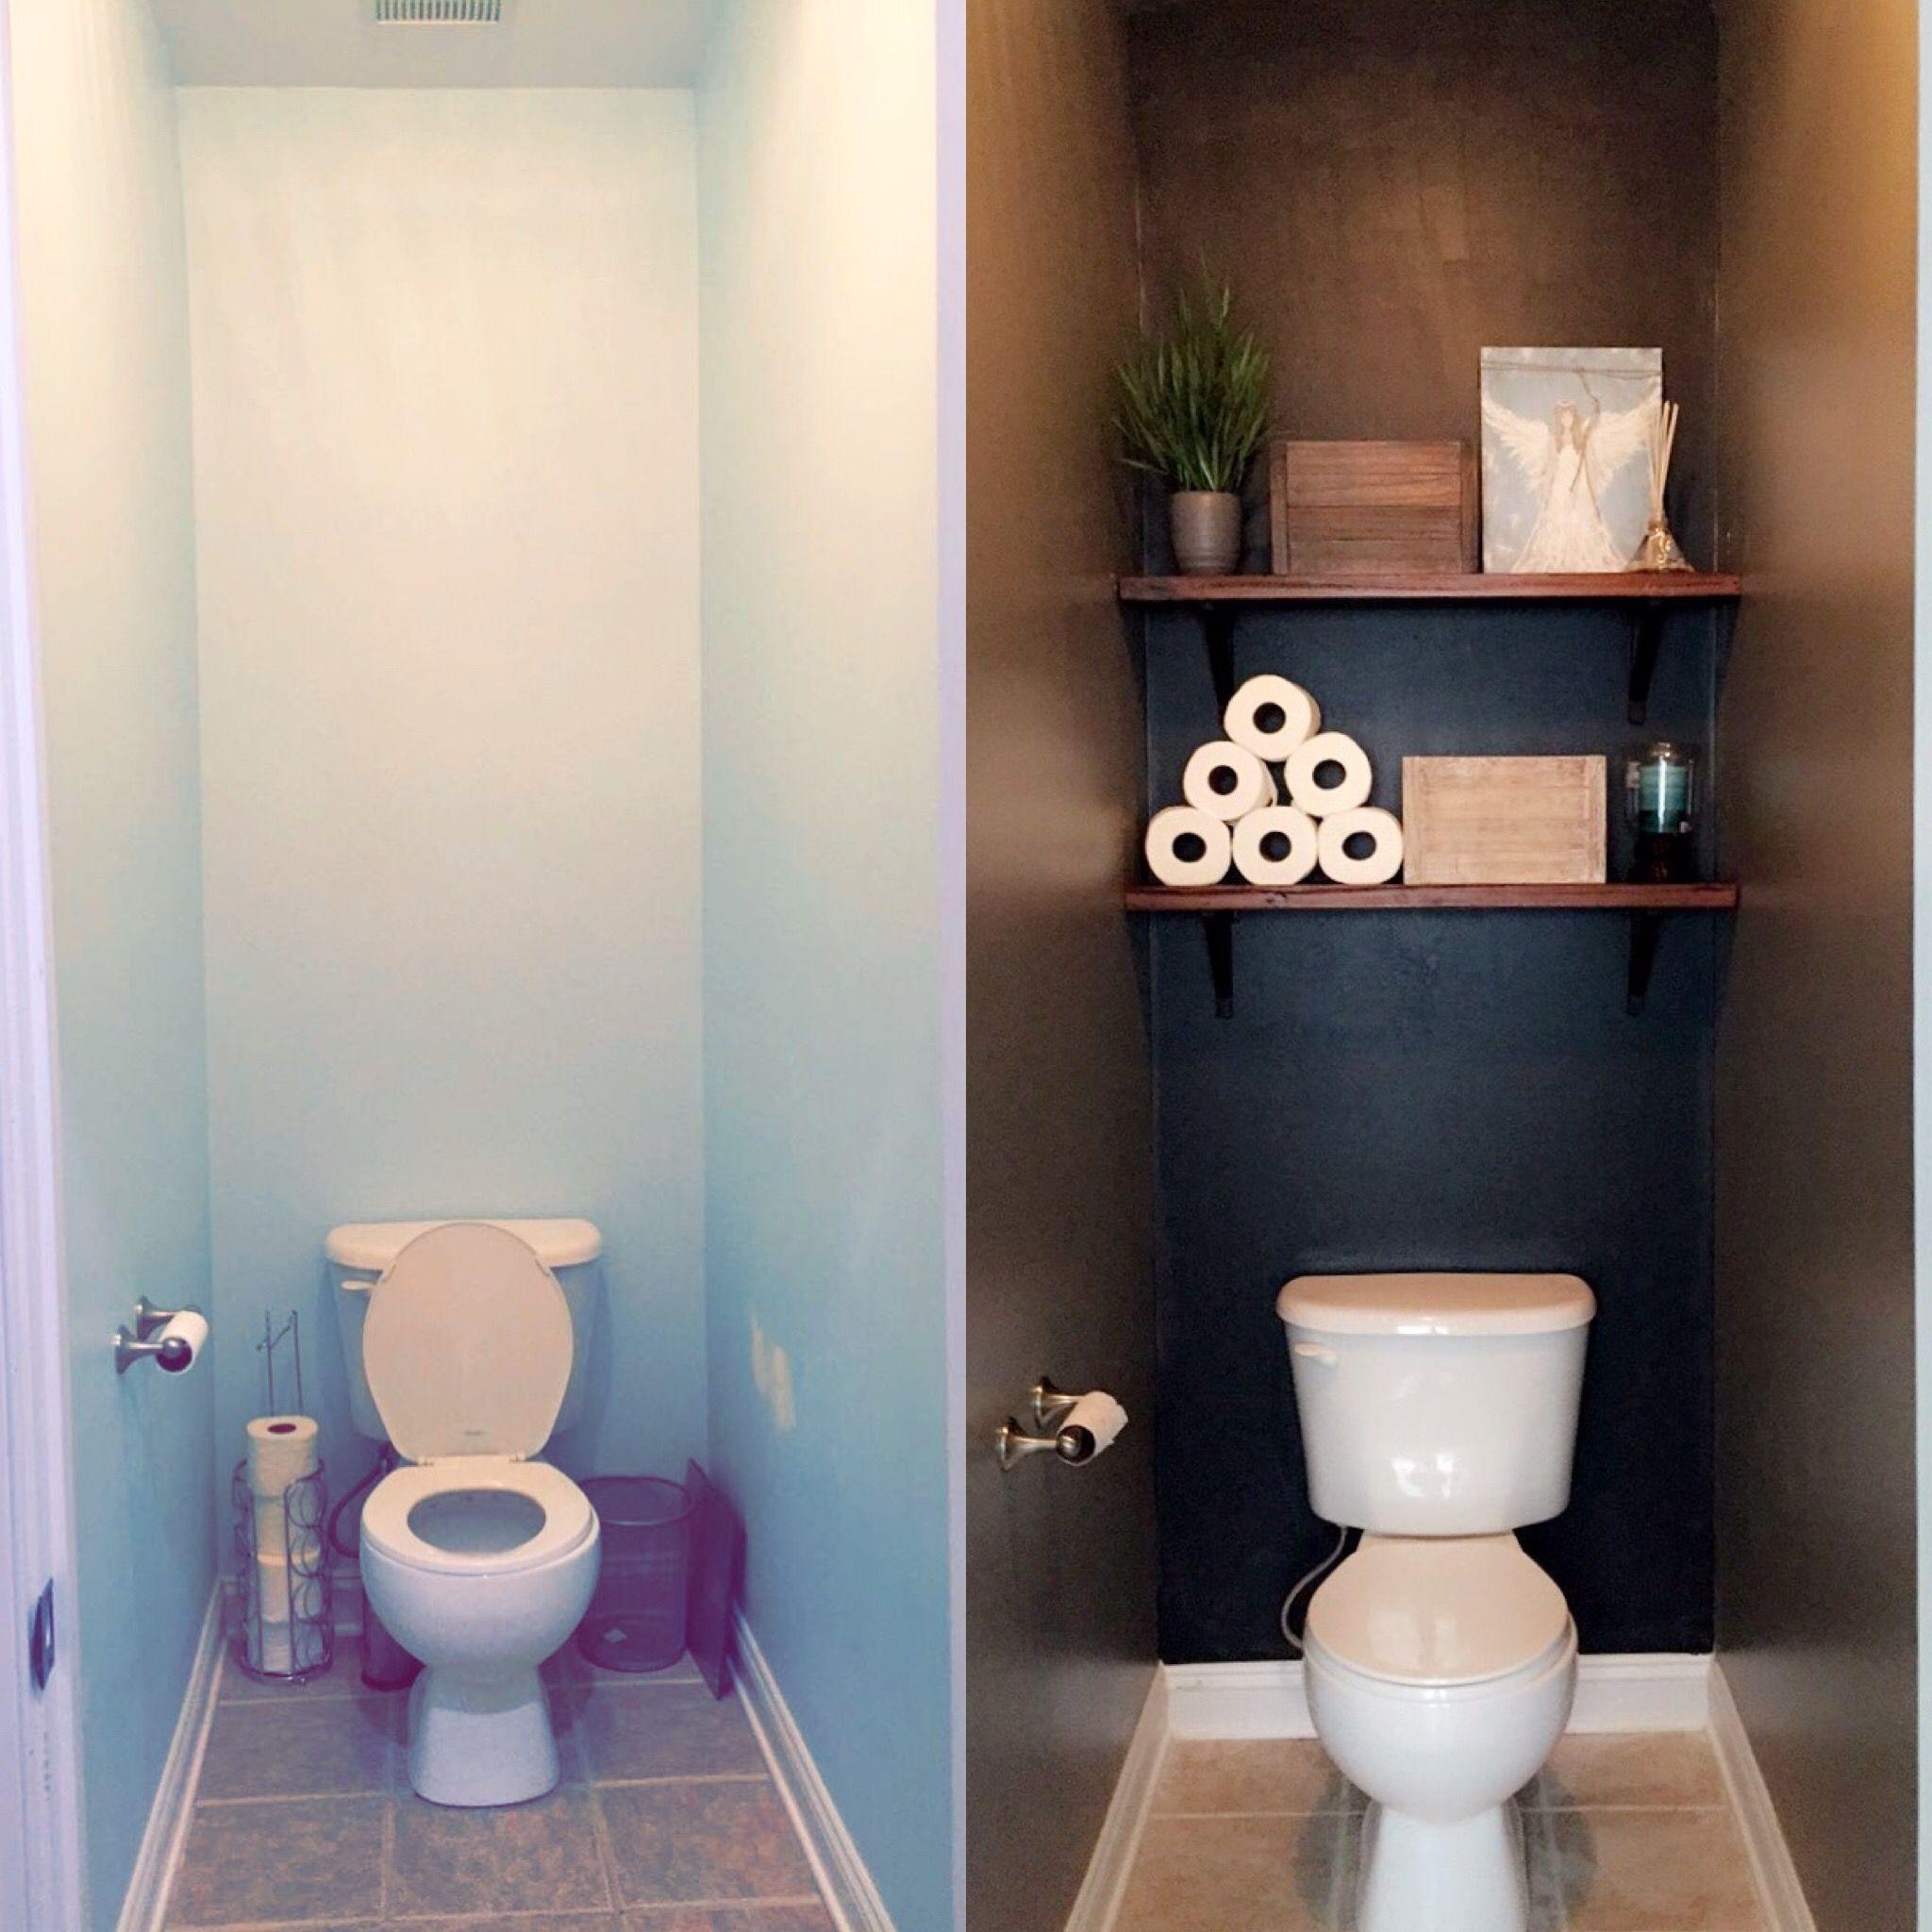 Bathroom Makeover Toilet Room Dark Colors Floating Shelves Baskets Clutter Free Black Wall In 2020 Small Toilet Room Toilet Room Decor Toilet Room